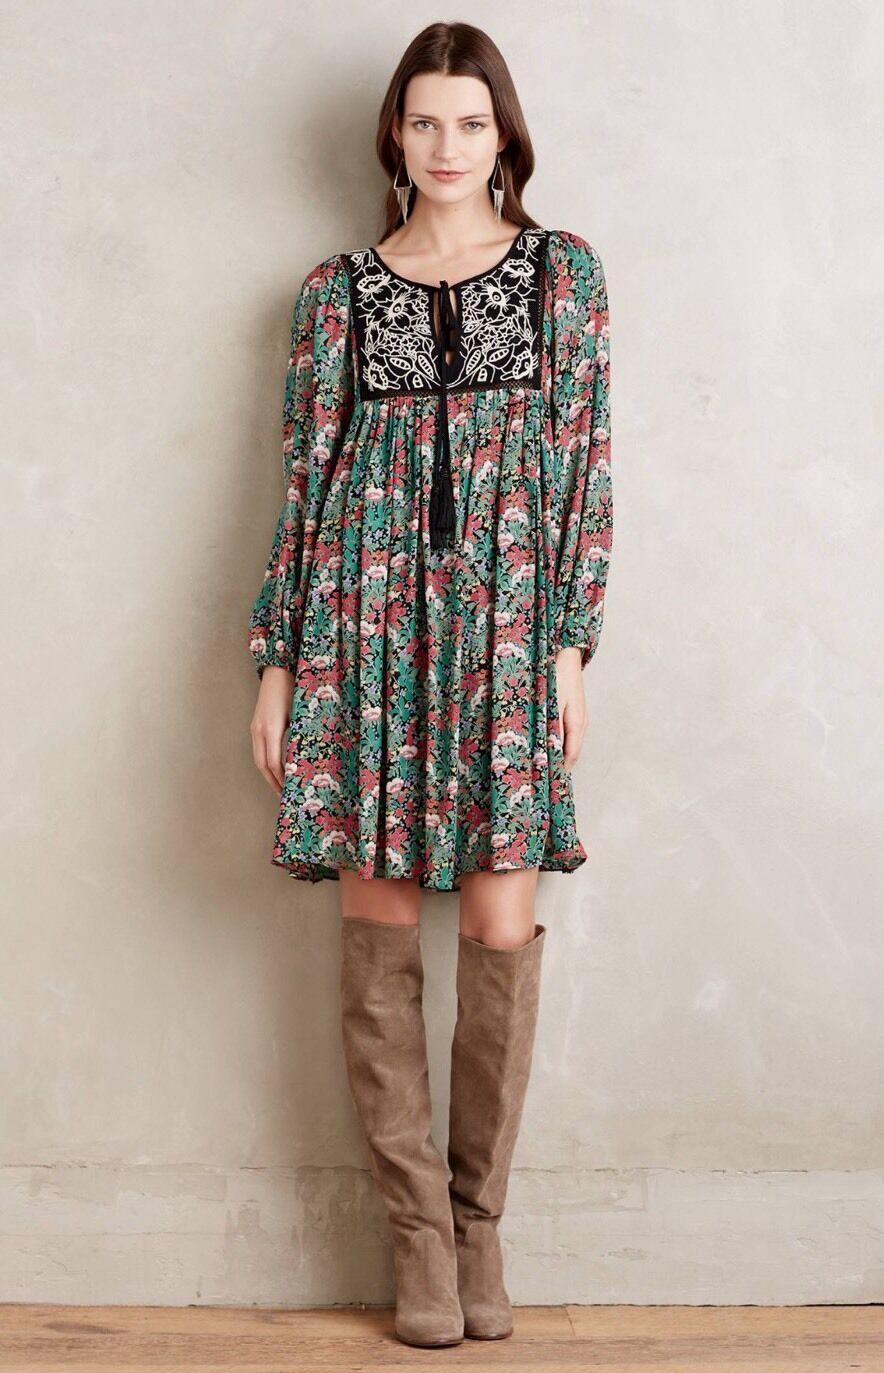 d277e2b404763f NEW Otteva Peasant Dress Größe Small Floral Print Anthropologie ...